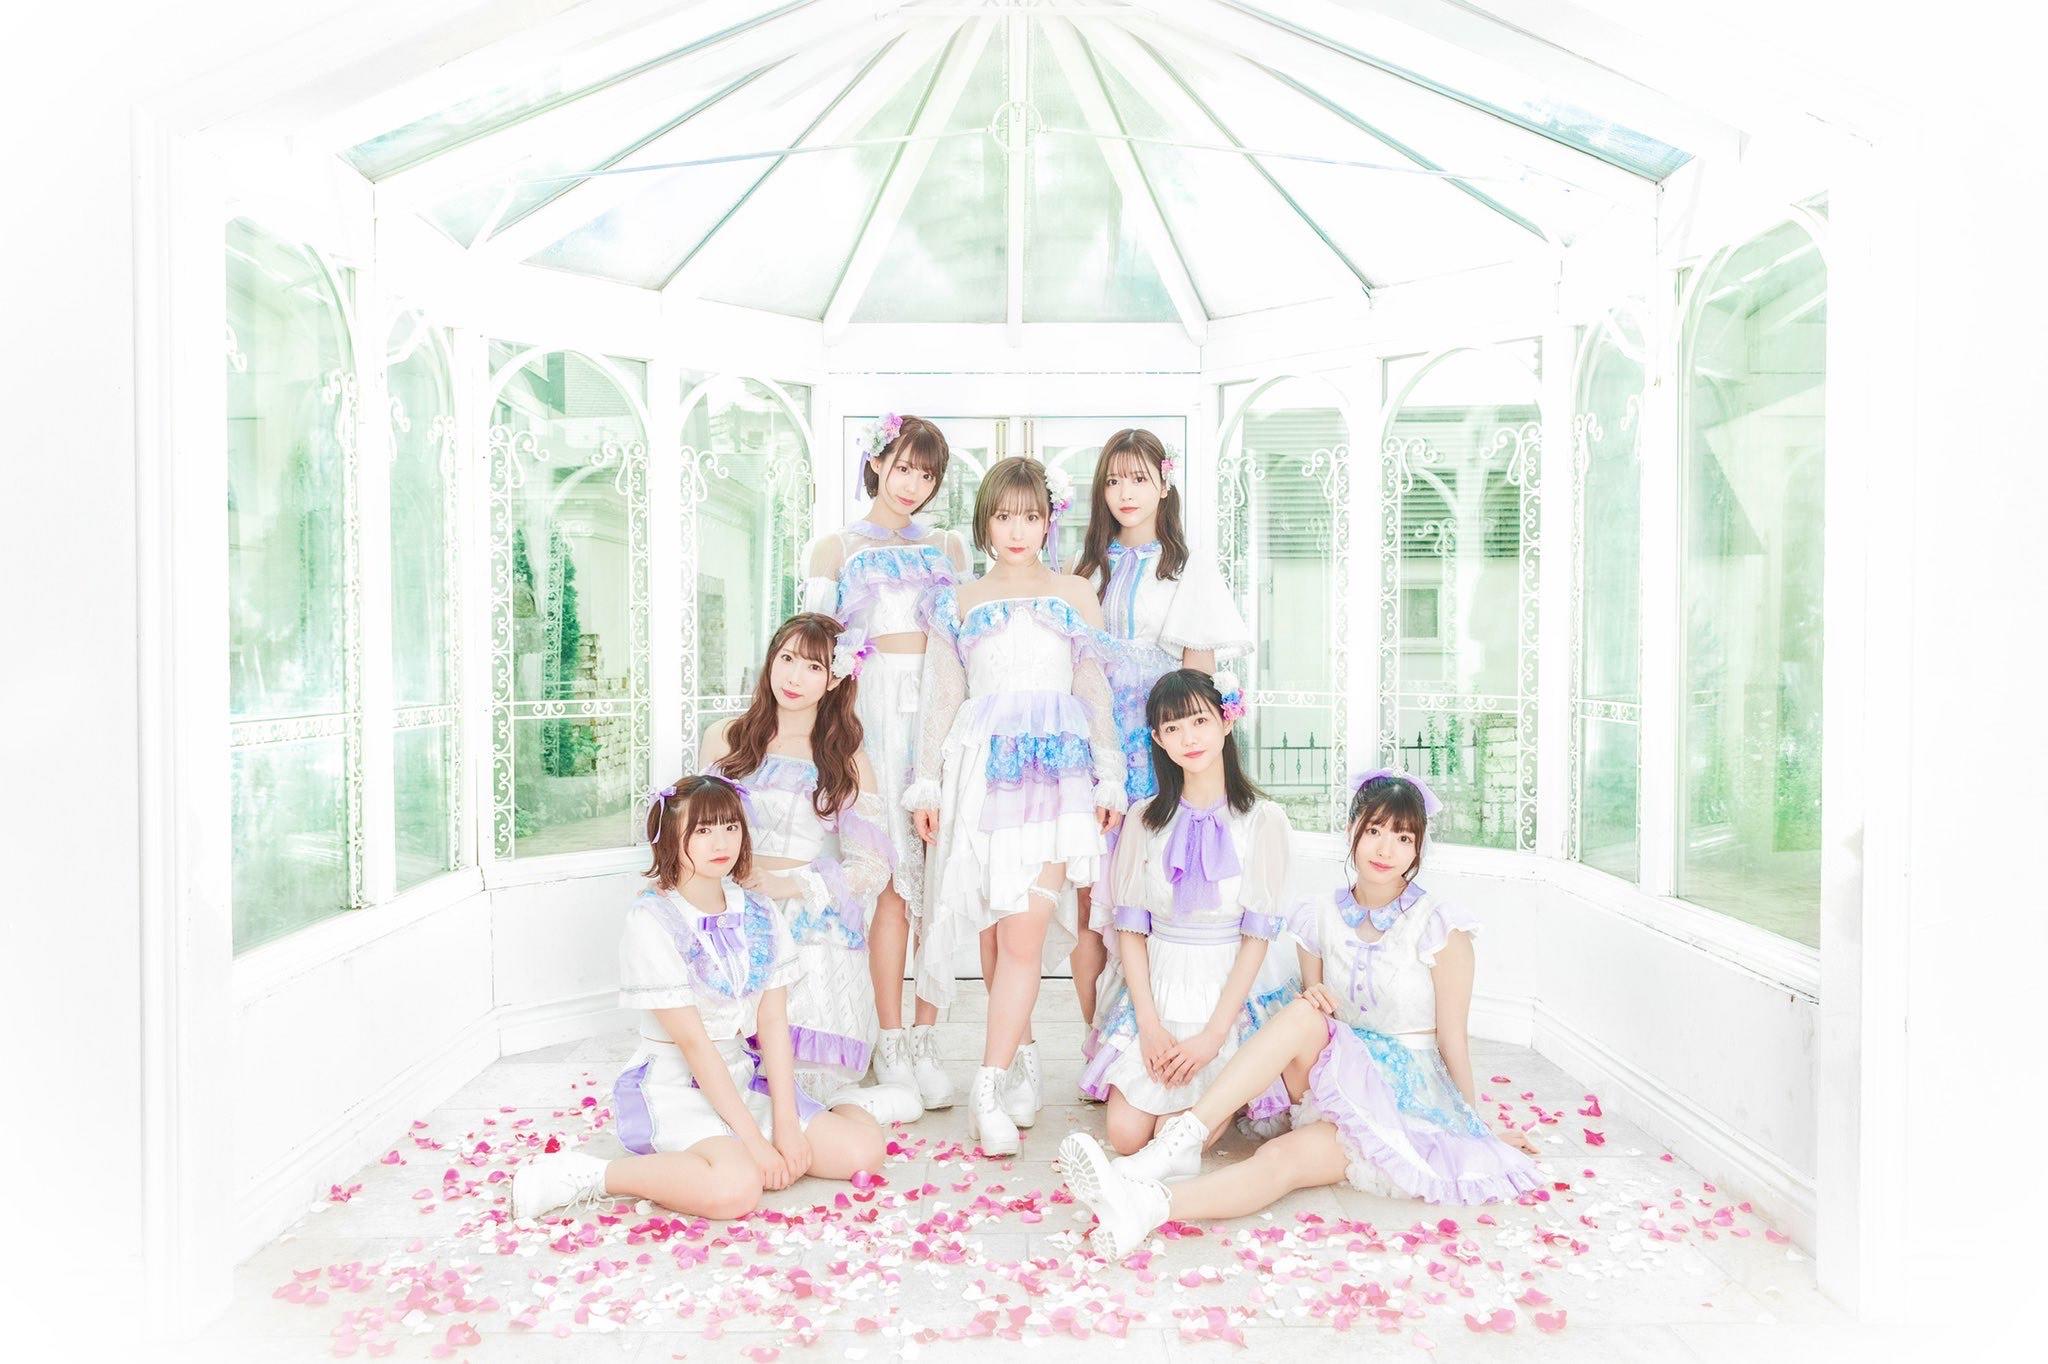 AKIBAカルチャーズ劇場LIVE #549